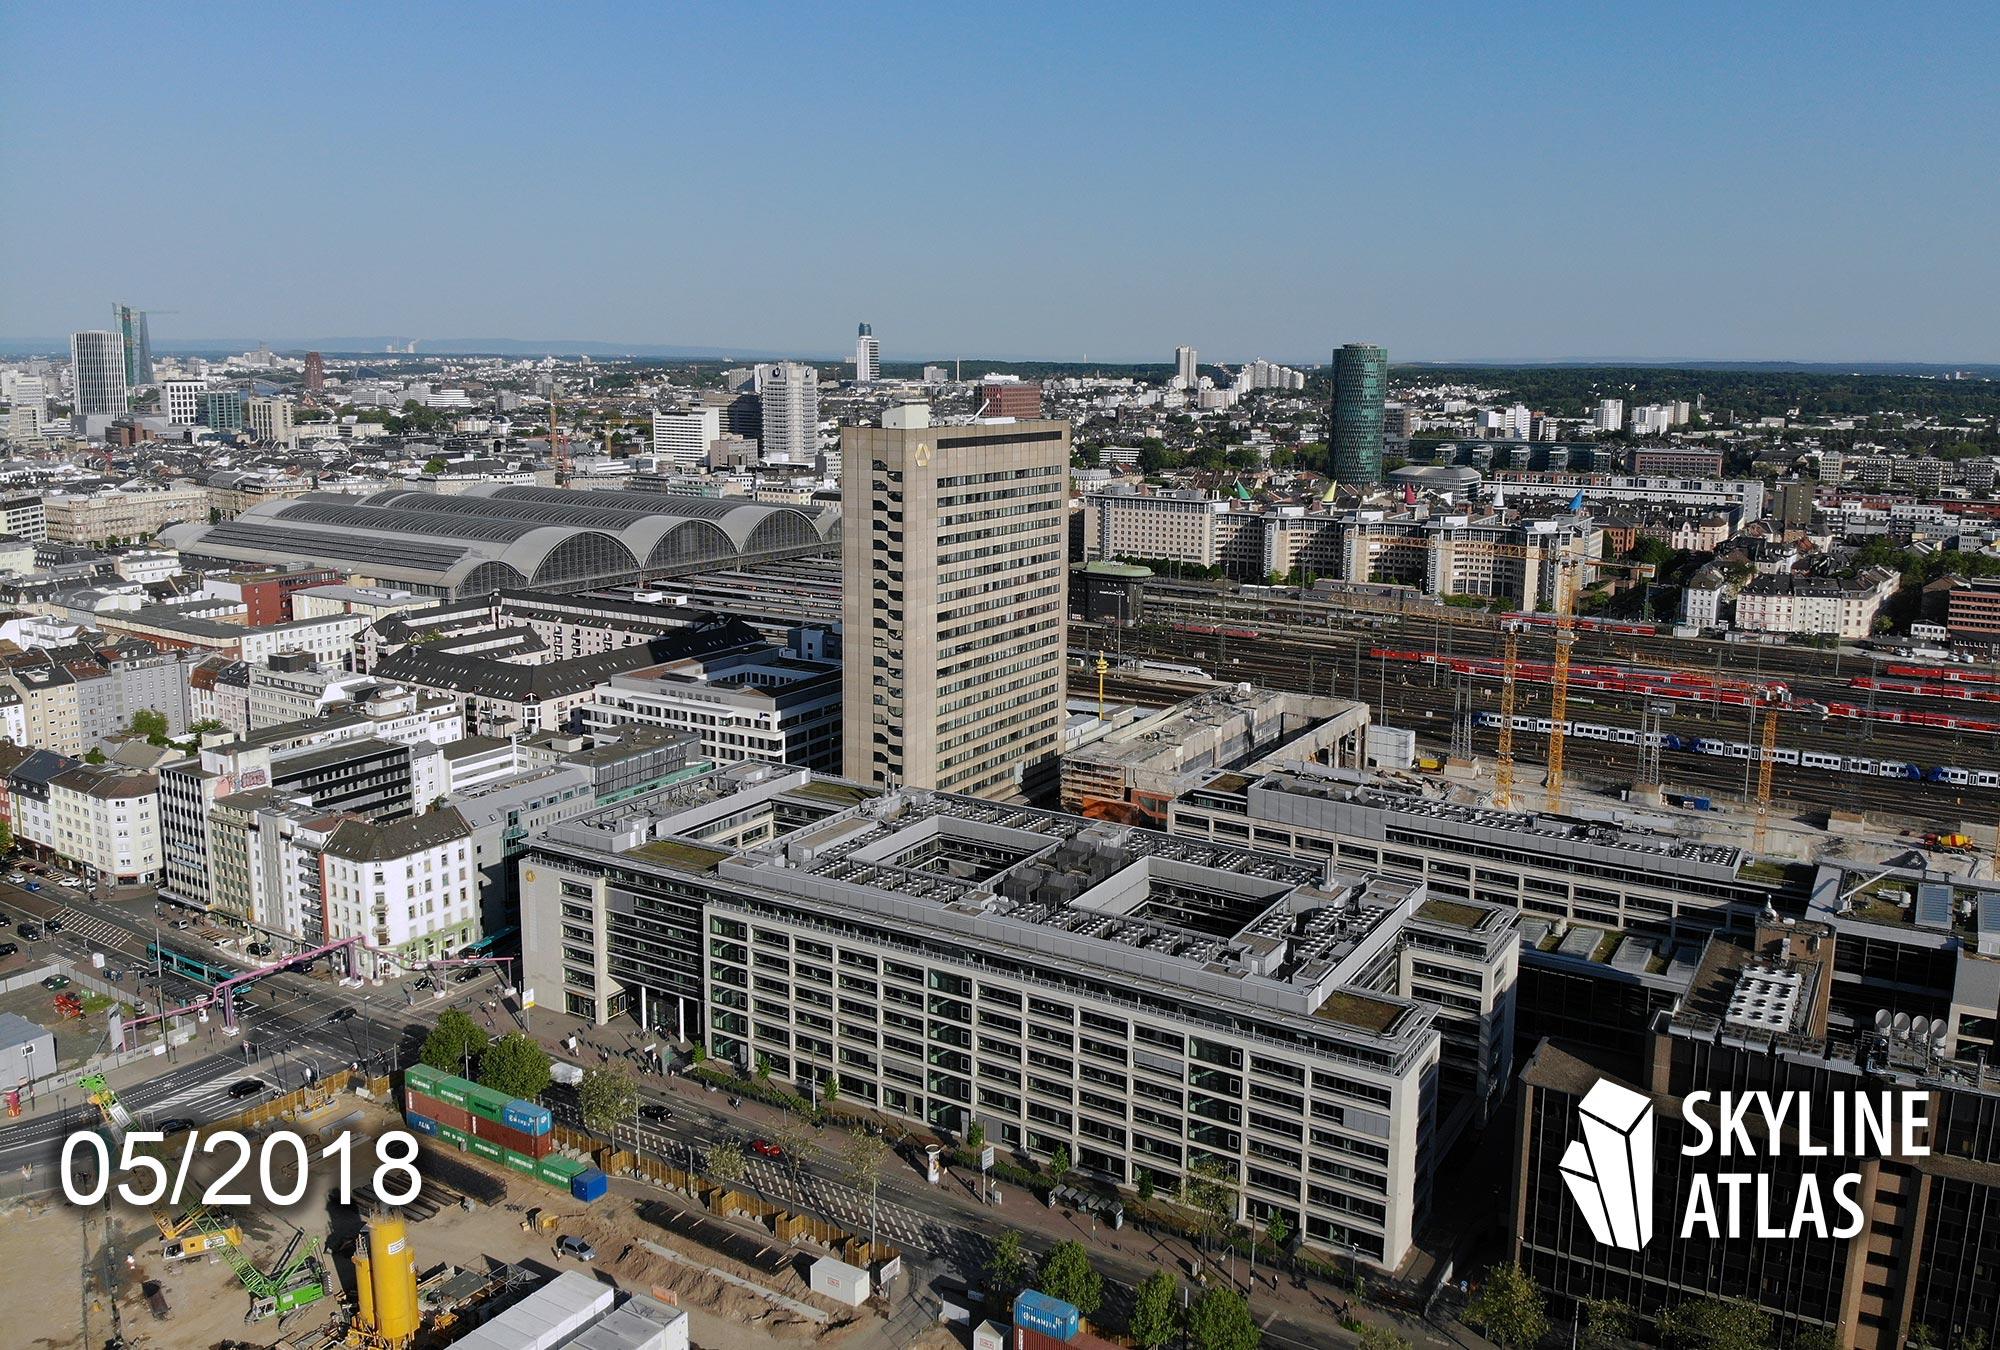 Virage Frankfurt - Commerzbank Trading Center - Gallus district - Post highrise